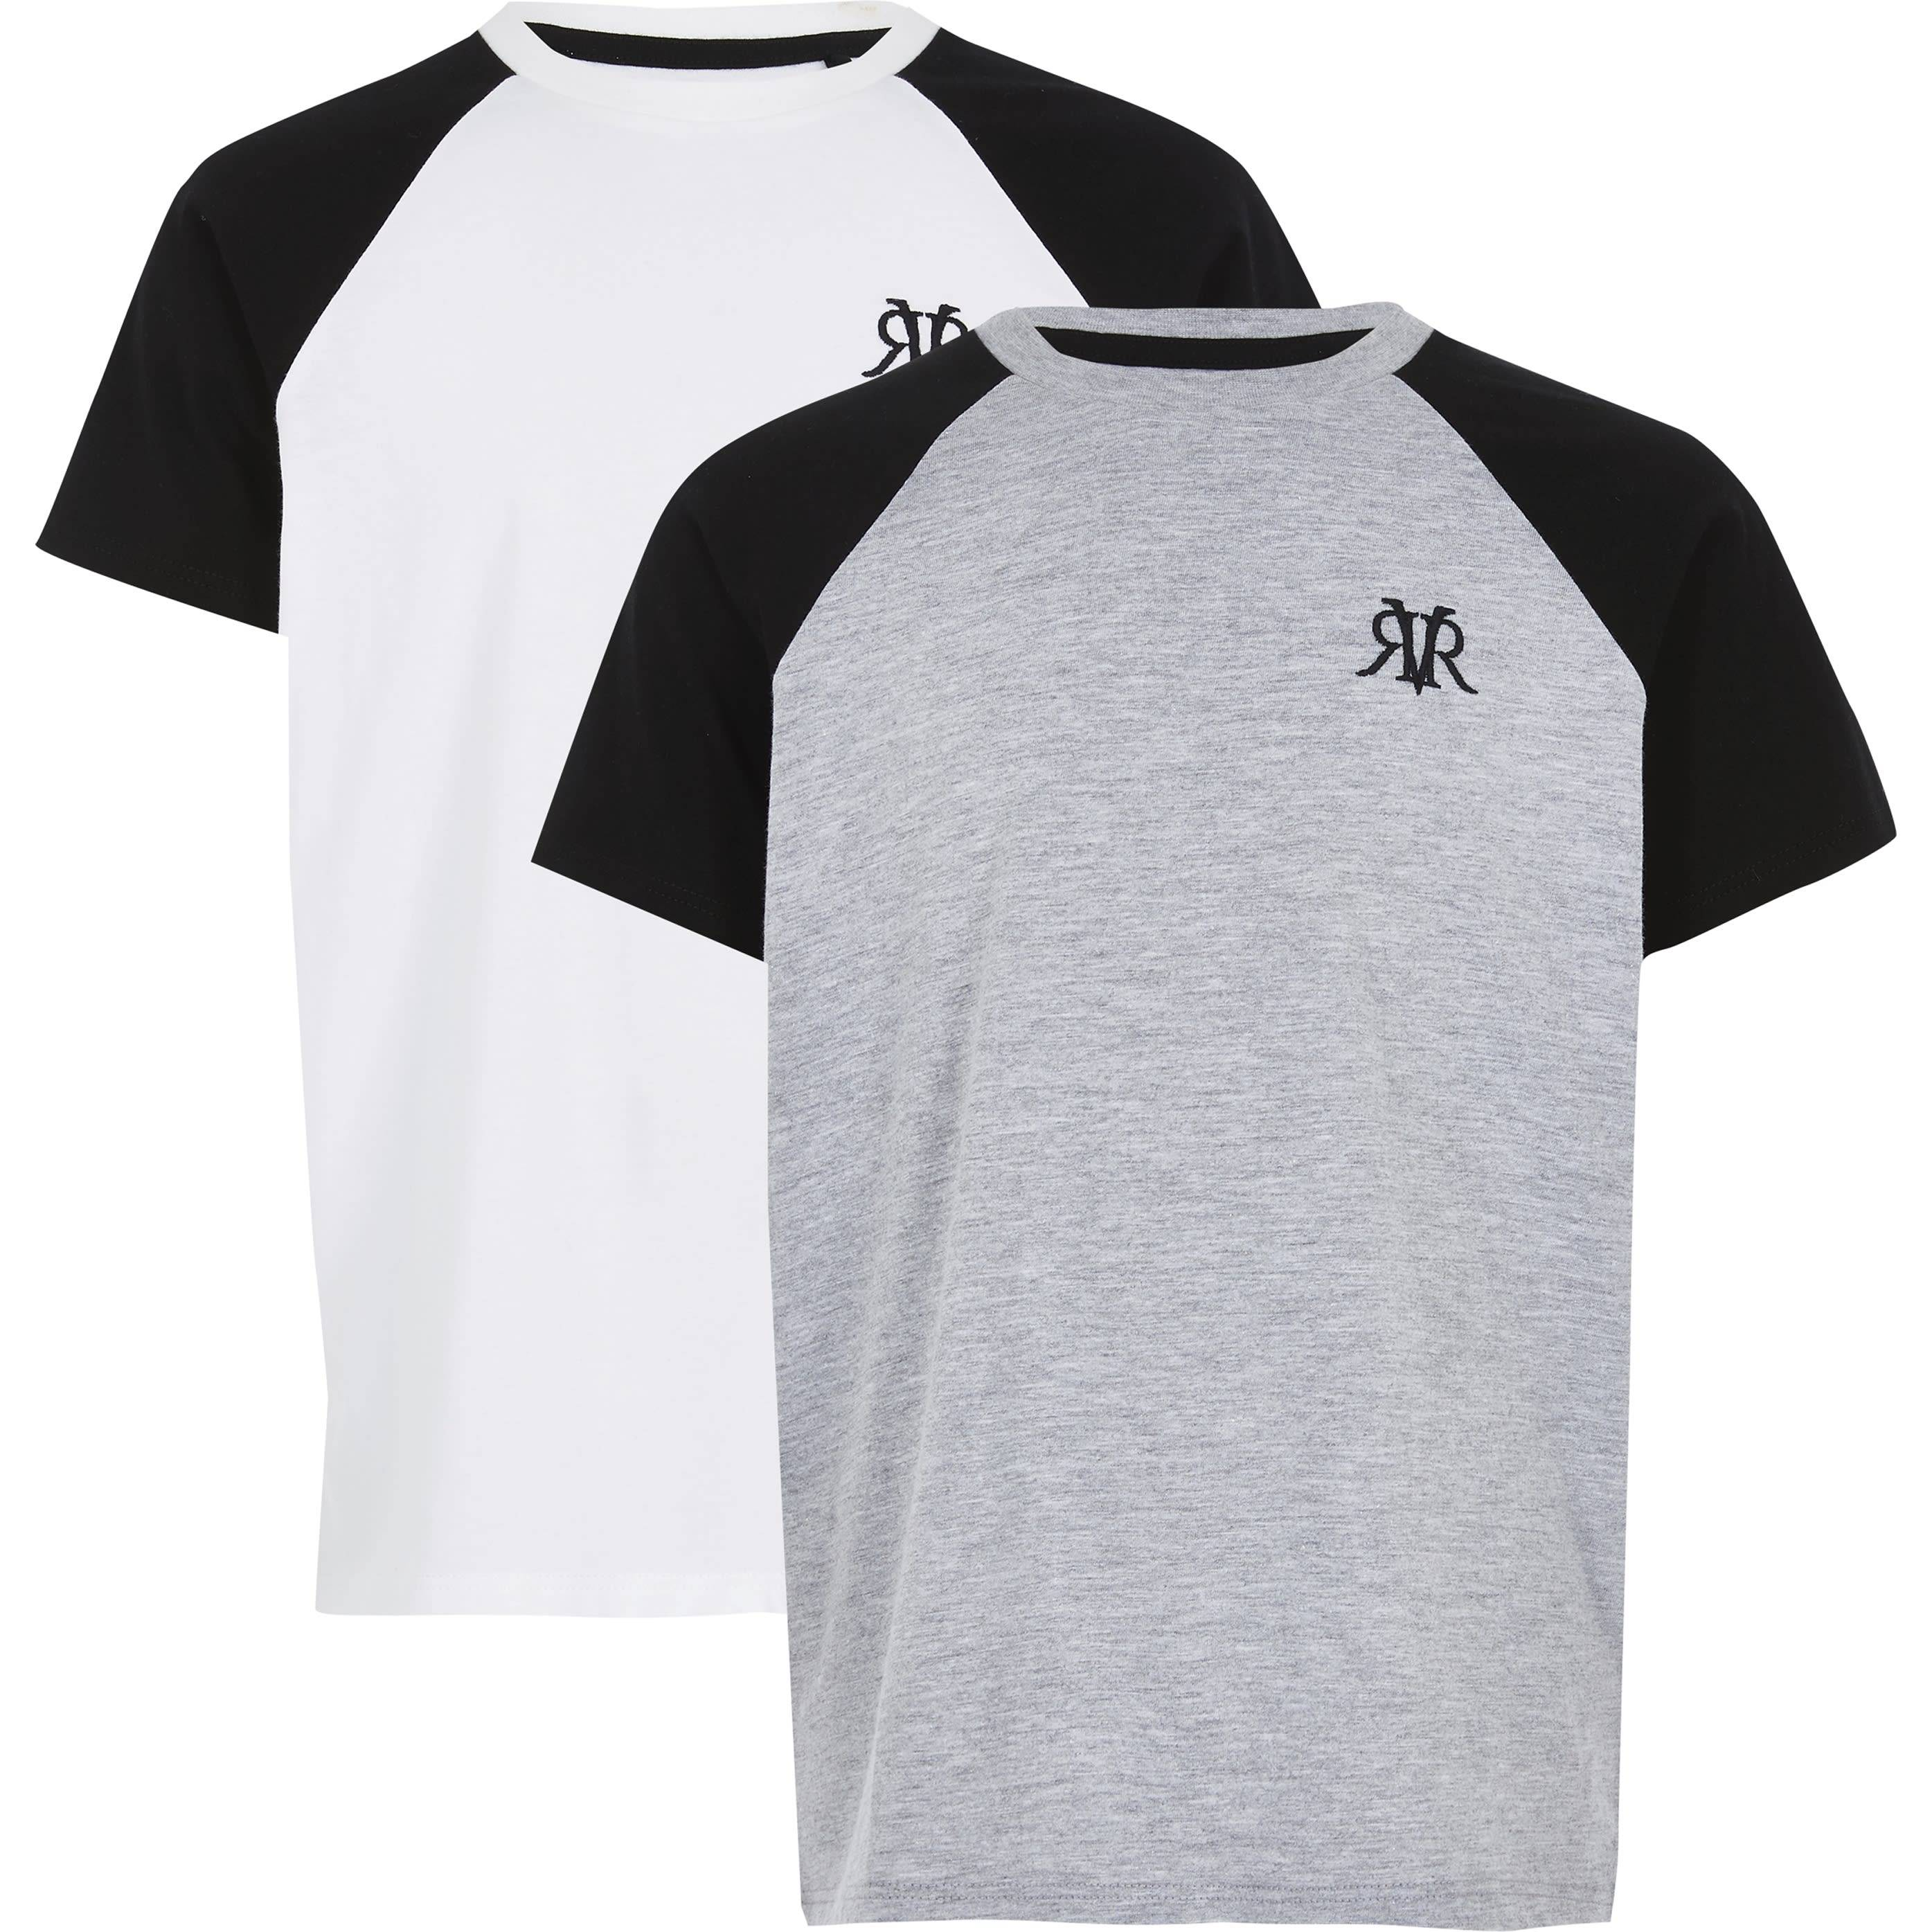 River Island Boys White RVR raglan T-shirt 2 pack (9-10 Yrs)